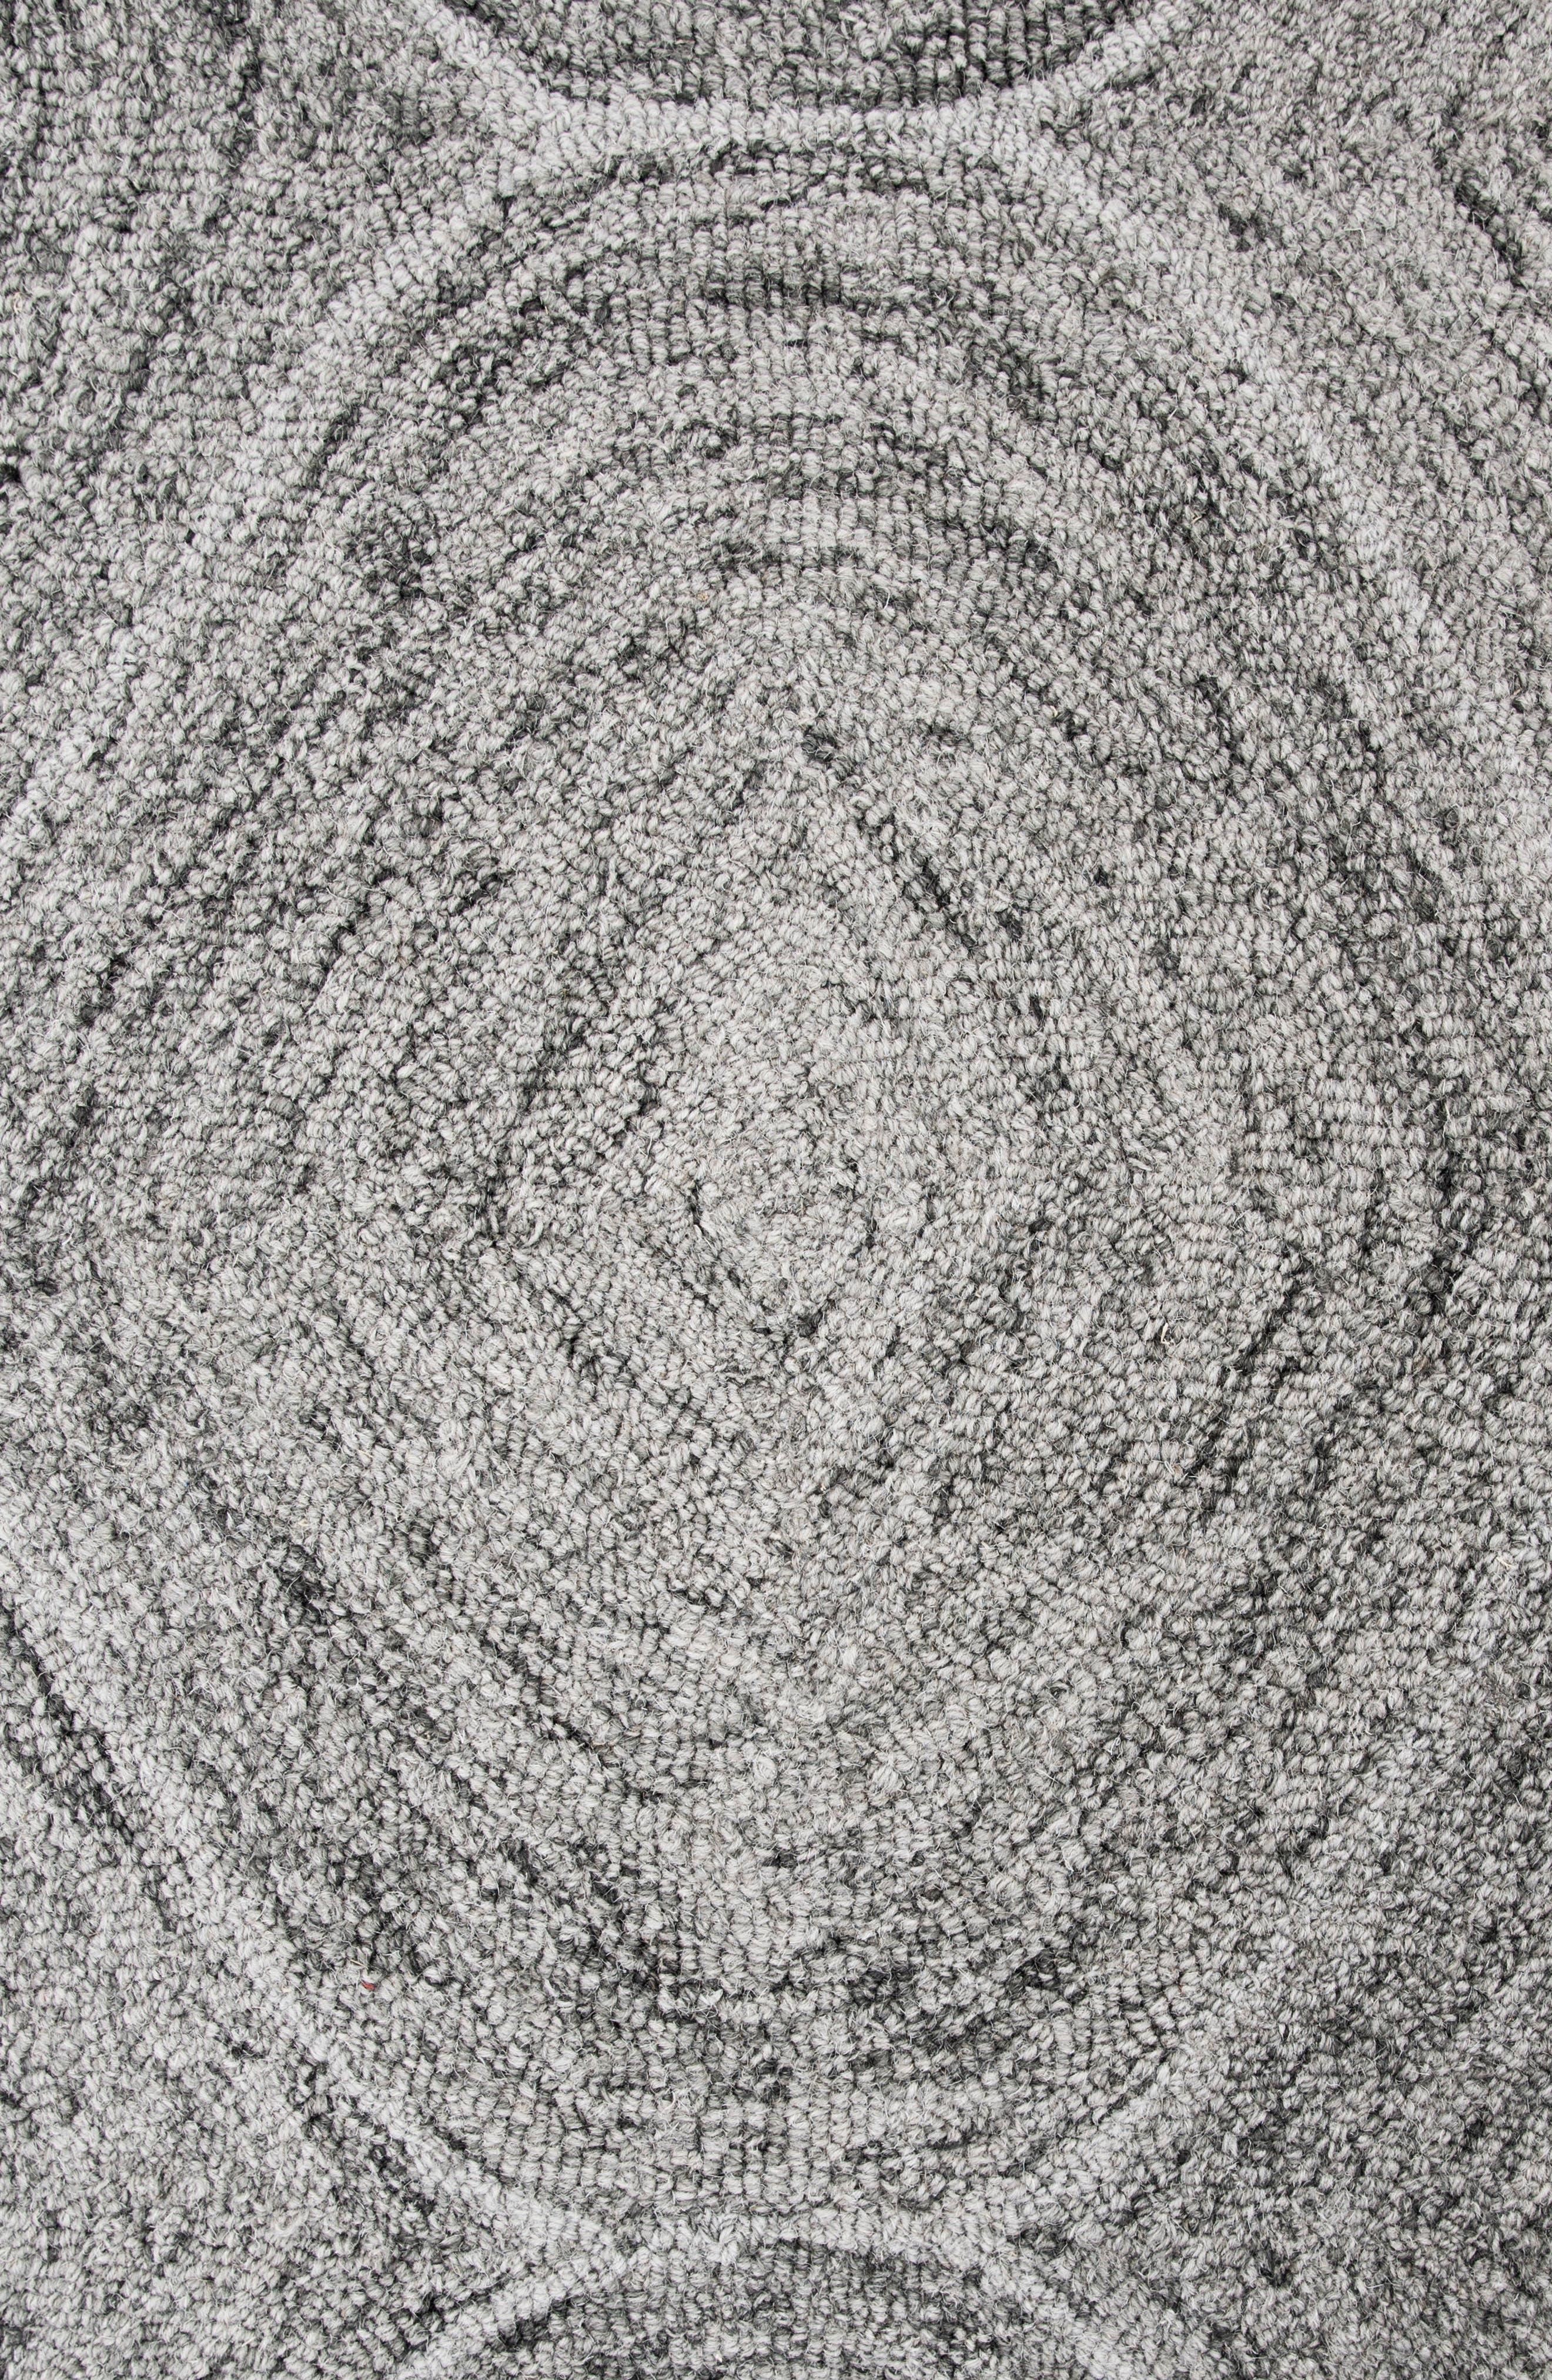 Irregular Diamond Hand Tufted Wool Area Rug,                             Alternate thumbnail 4, color,                             Grey